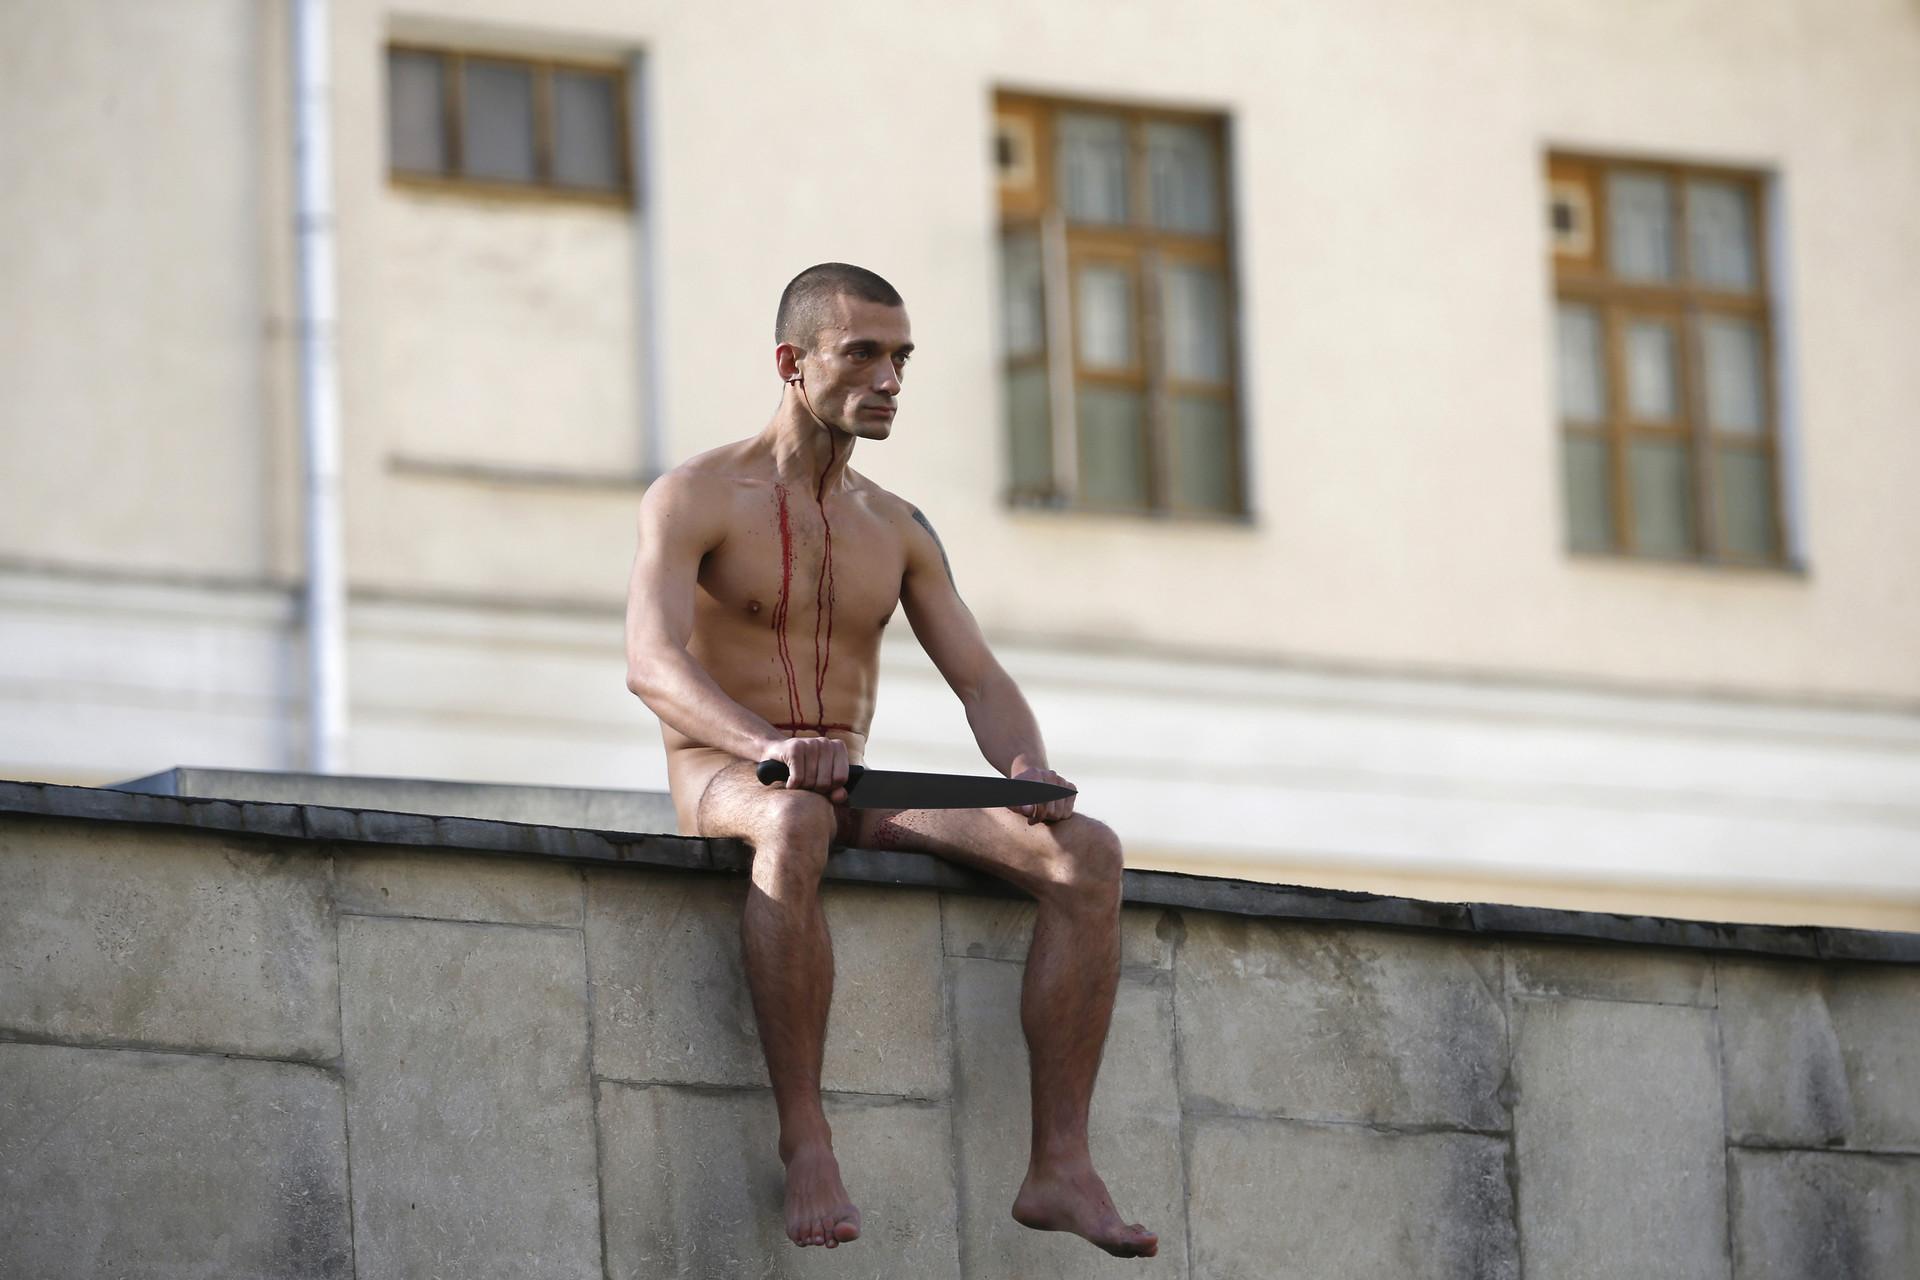 Pavlênski corta a orelha em protesto intitulado